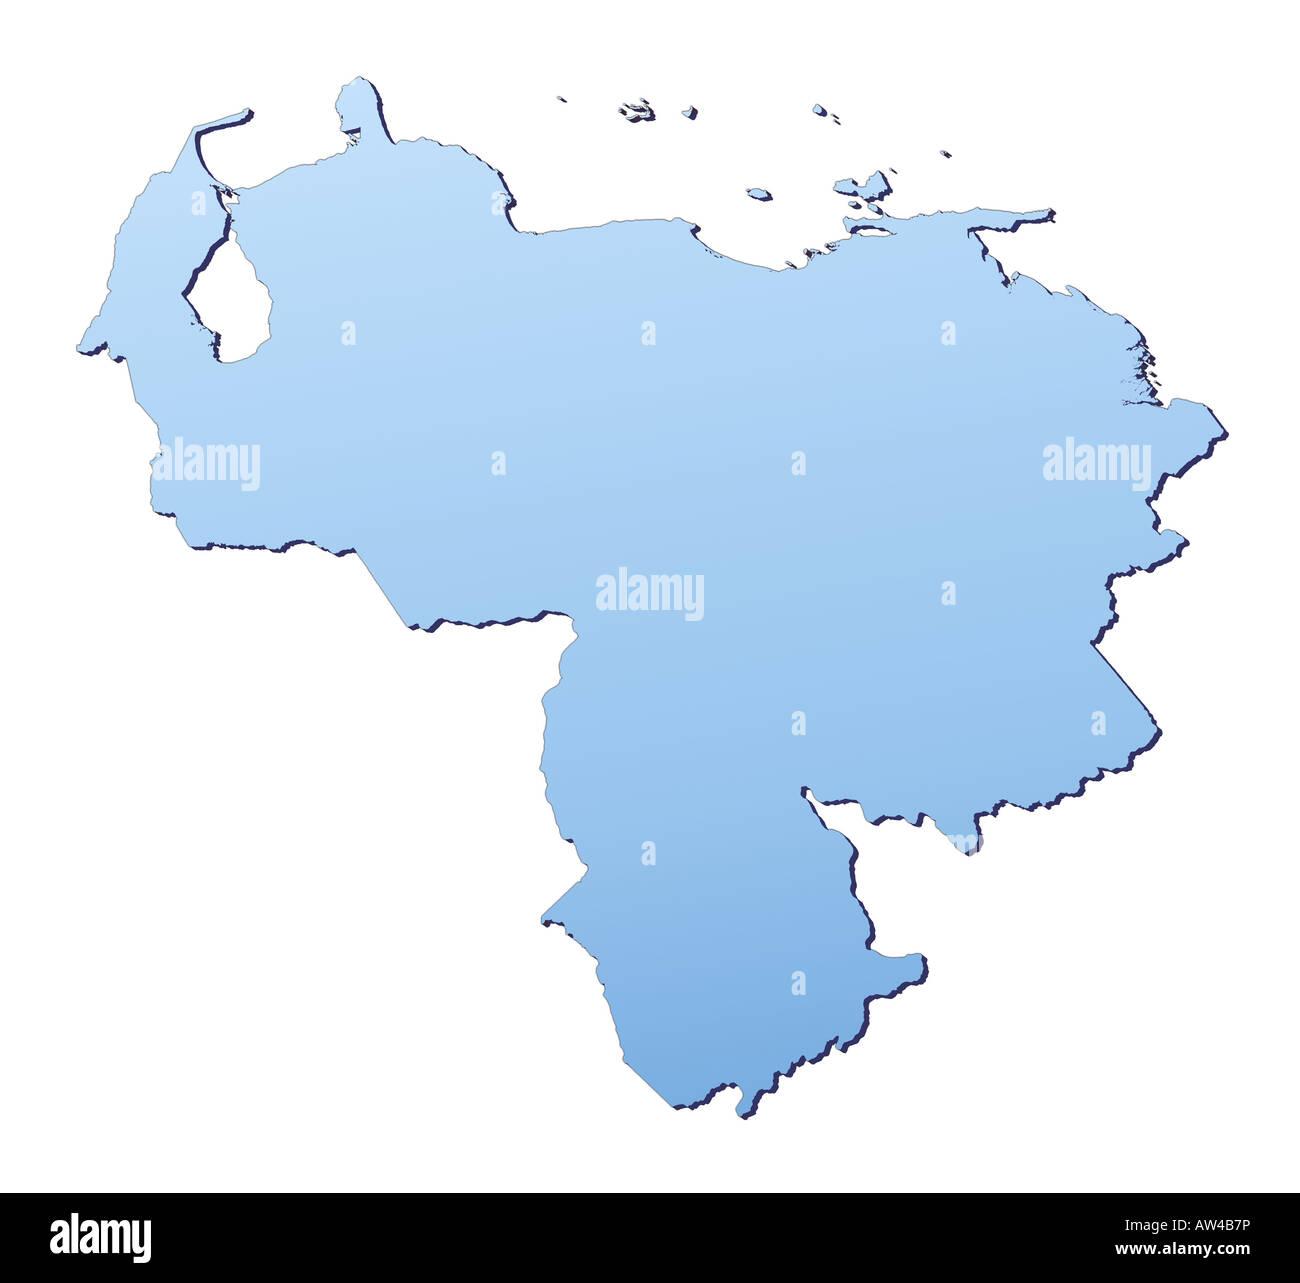 Venezuela map Stock Photo: 16461513 - Alamy